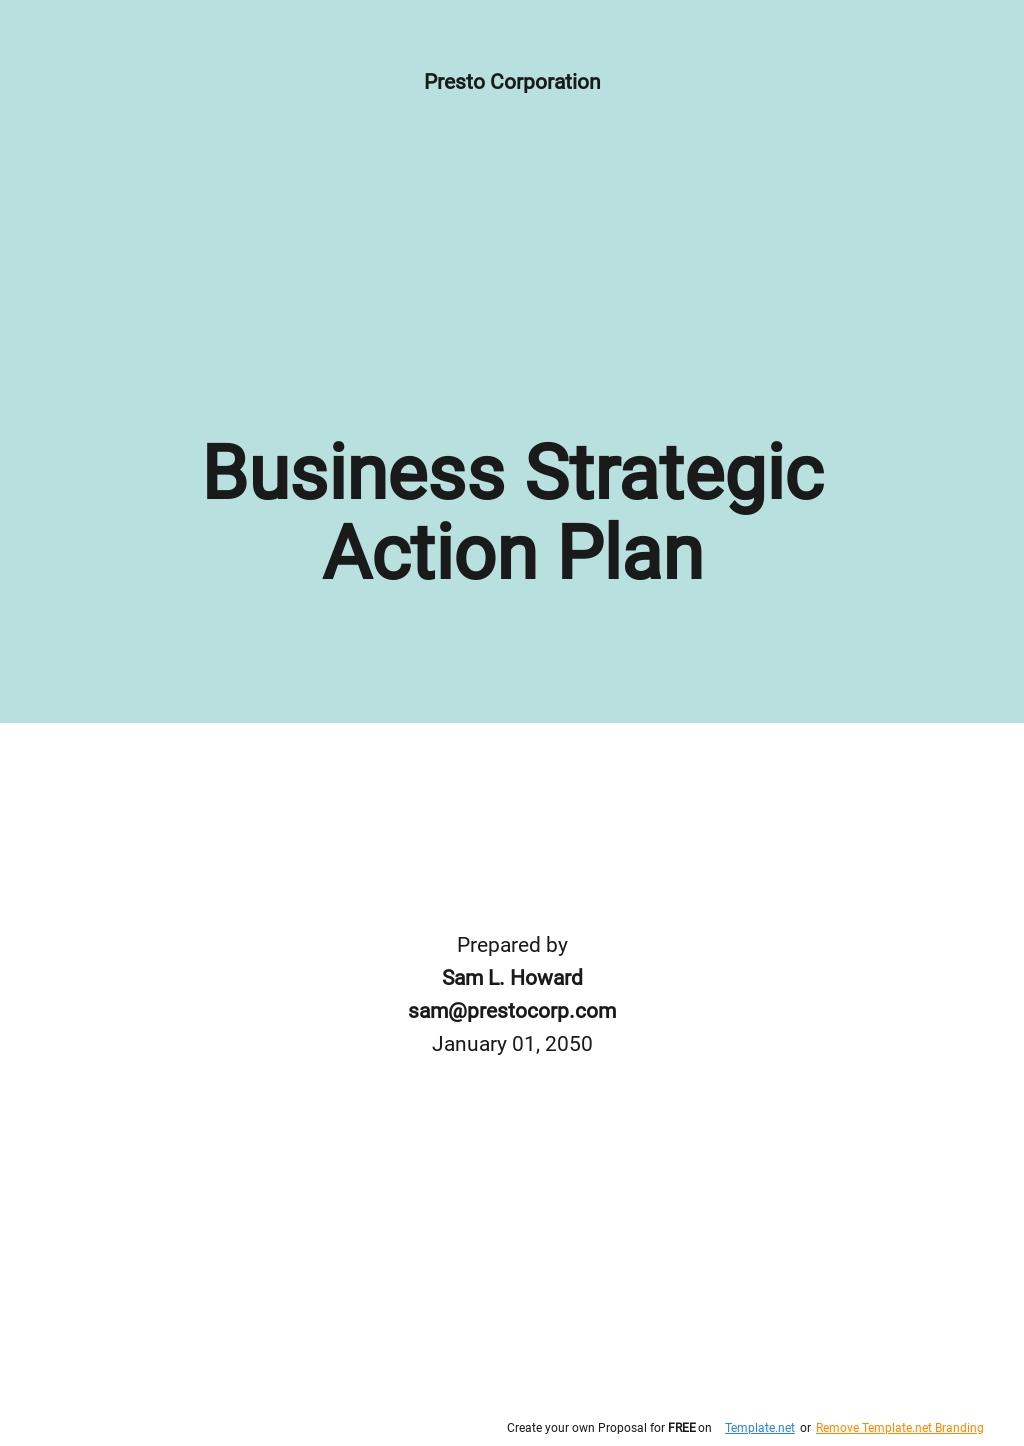 Business Strategic Action Plan Template.jpe